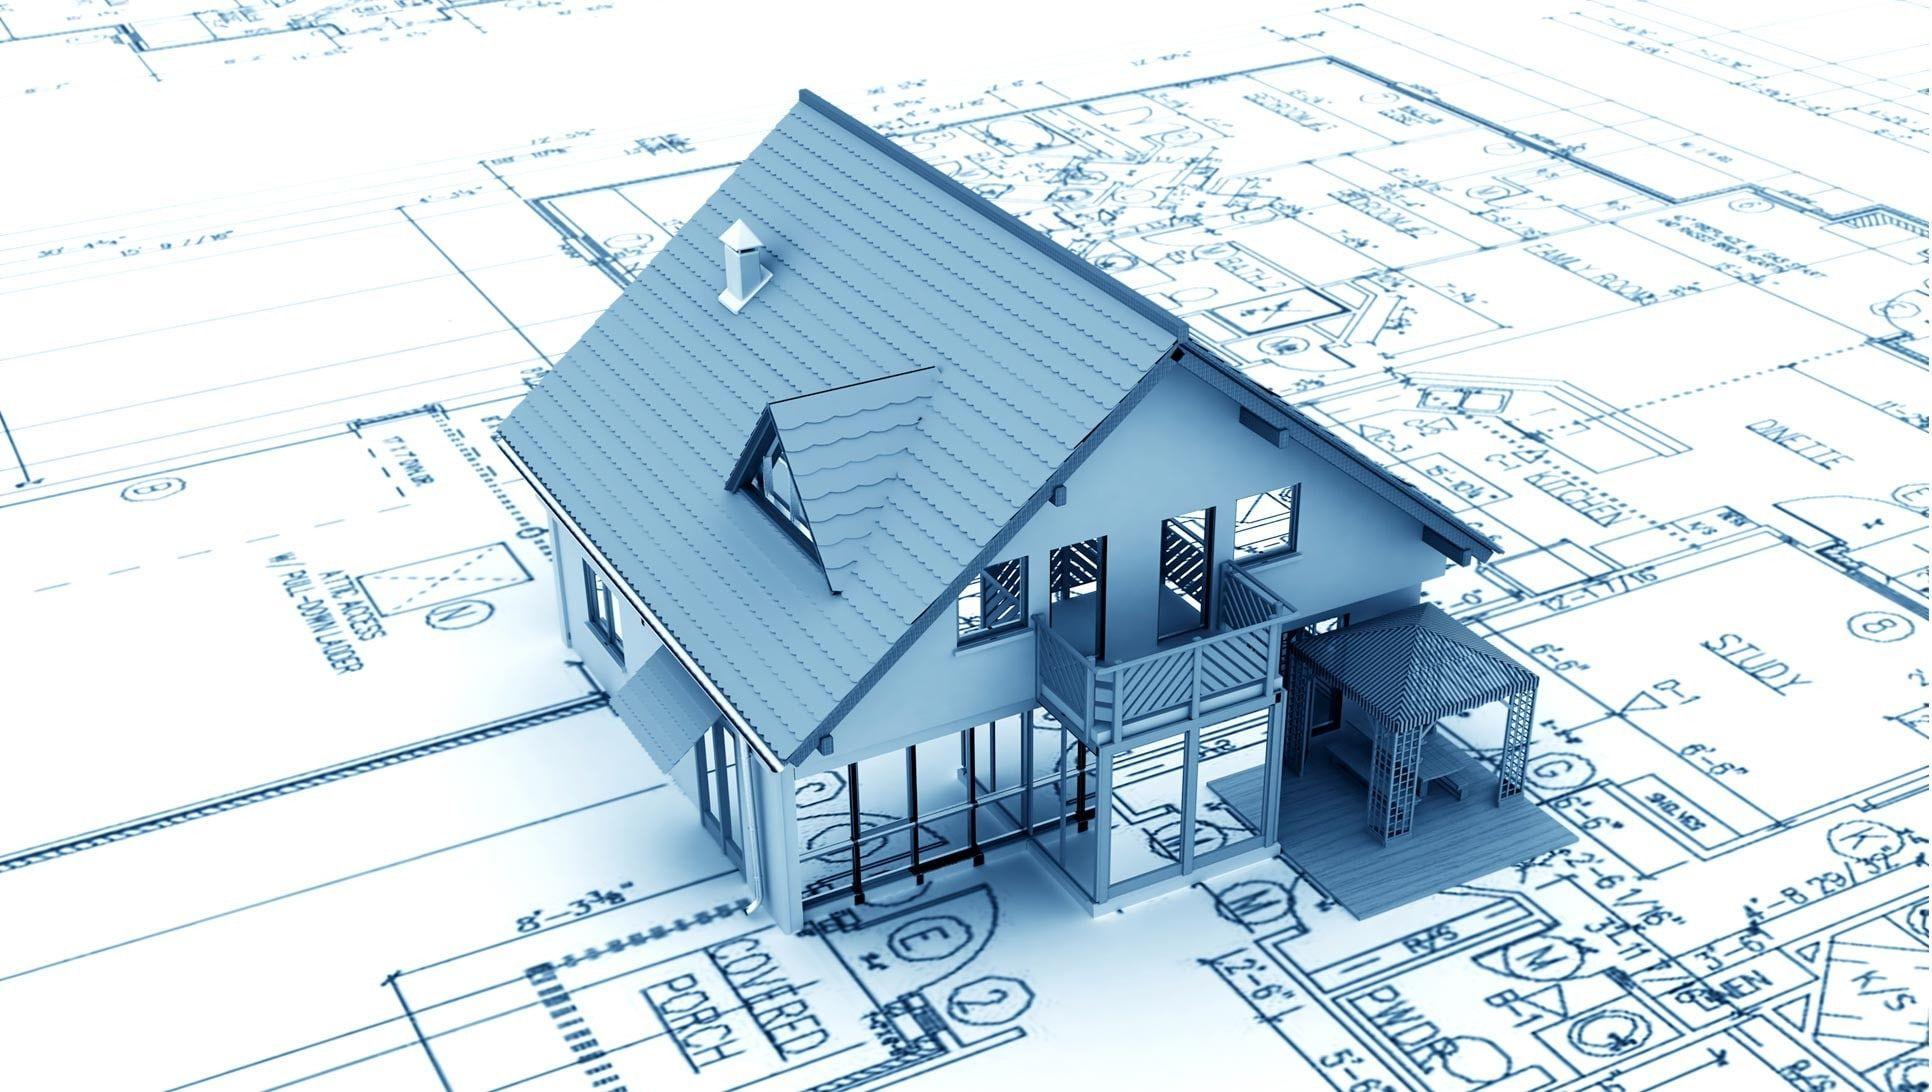 House Digital Art Engineering Drawing Architecture 1080p Wallpaper Hdwallpaper Desktop Architecture Blueprints Architecture Drawing Architecture 1080p civil engineering hd wallpapers